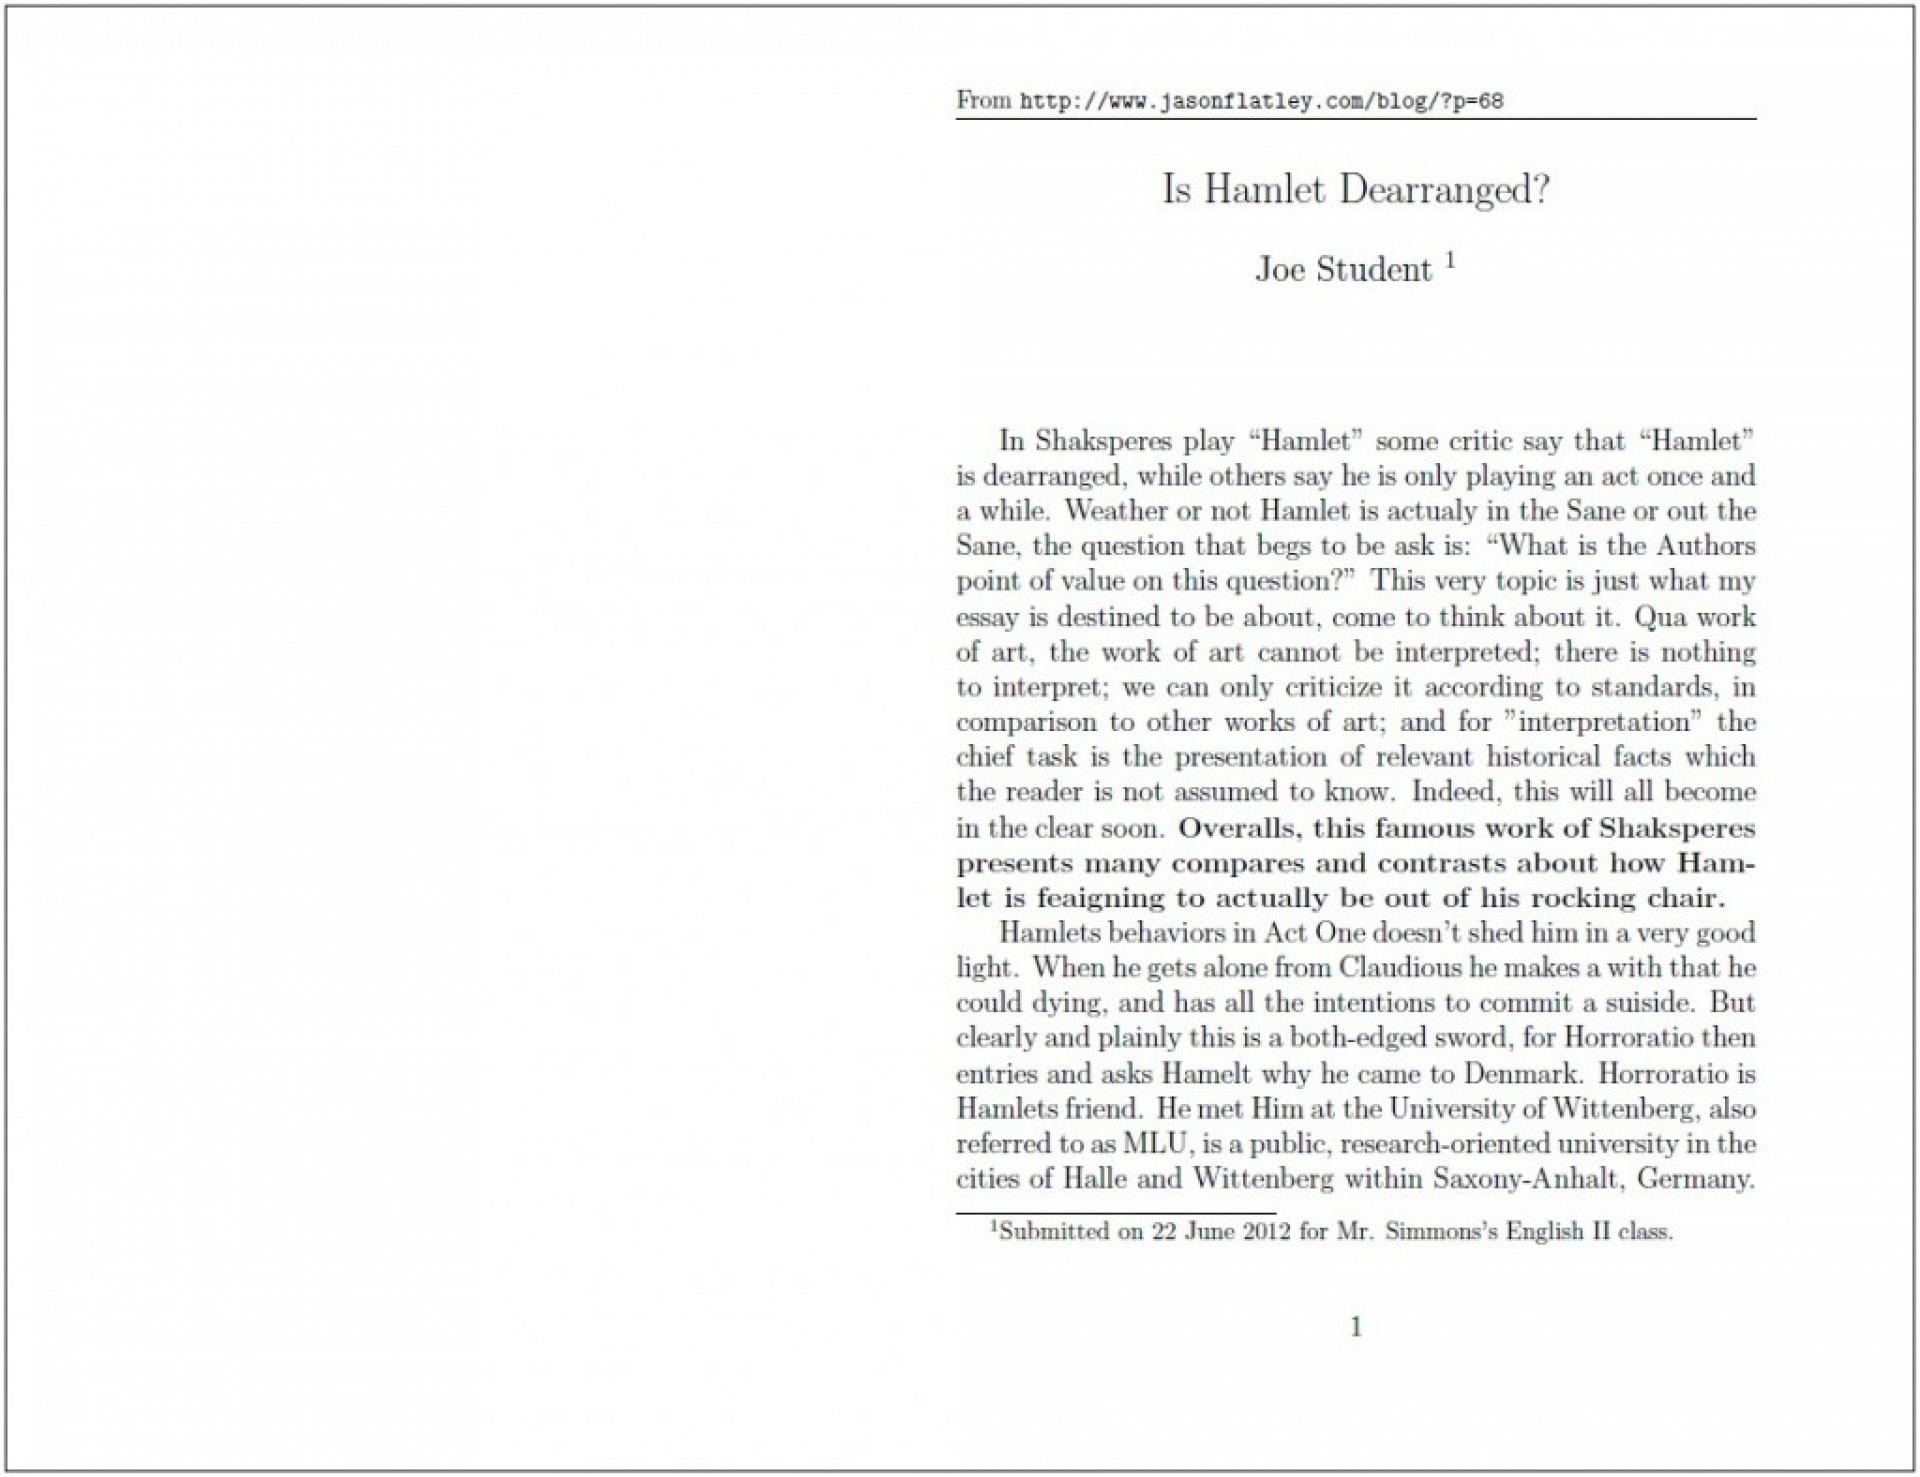 018 Standard Essay Cover Letter Written Format Writing Joe Student Hamlet Proposed Proper Paper Argumentative For College Application Scholarship Apa Pdf Mla Style Form Formidable Reflection 1920